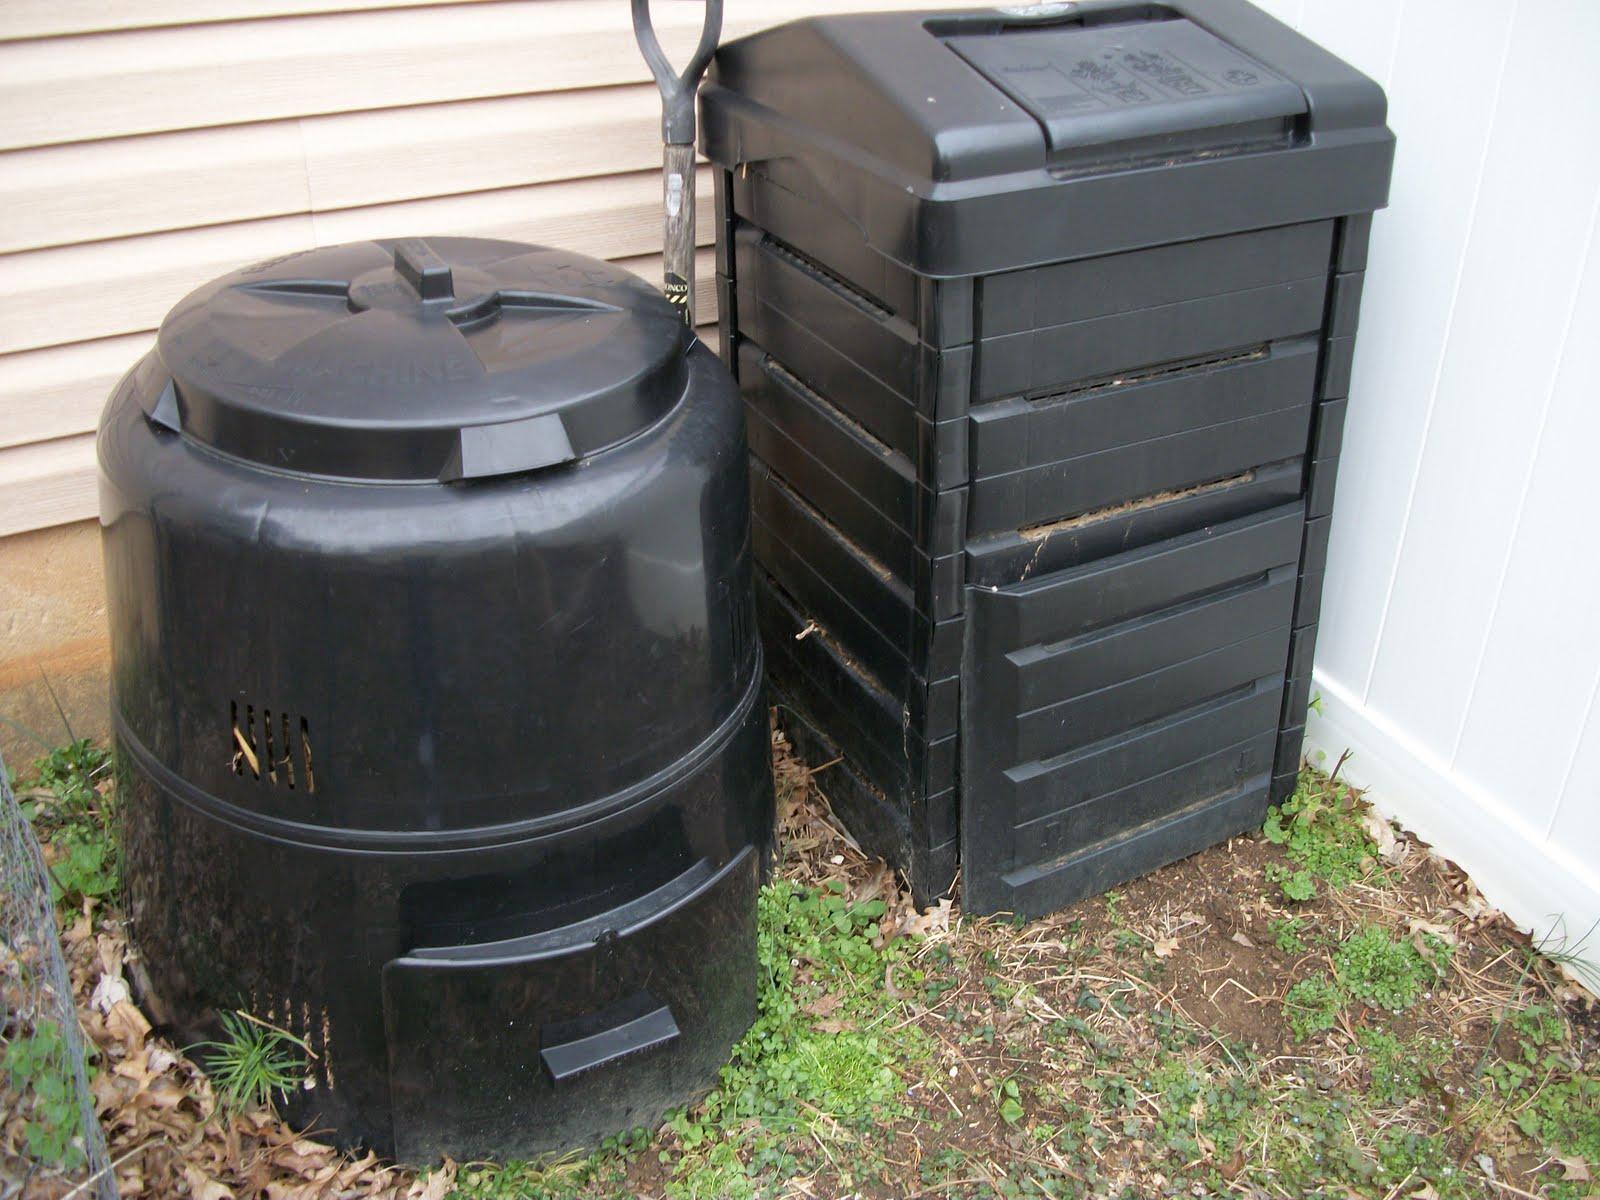 Backyard Bins how to start & maintain a backyard compost